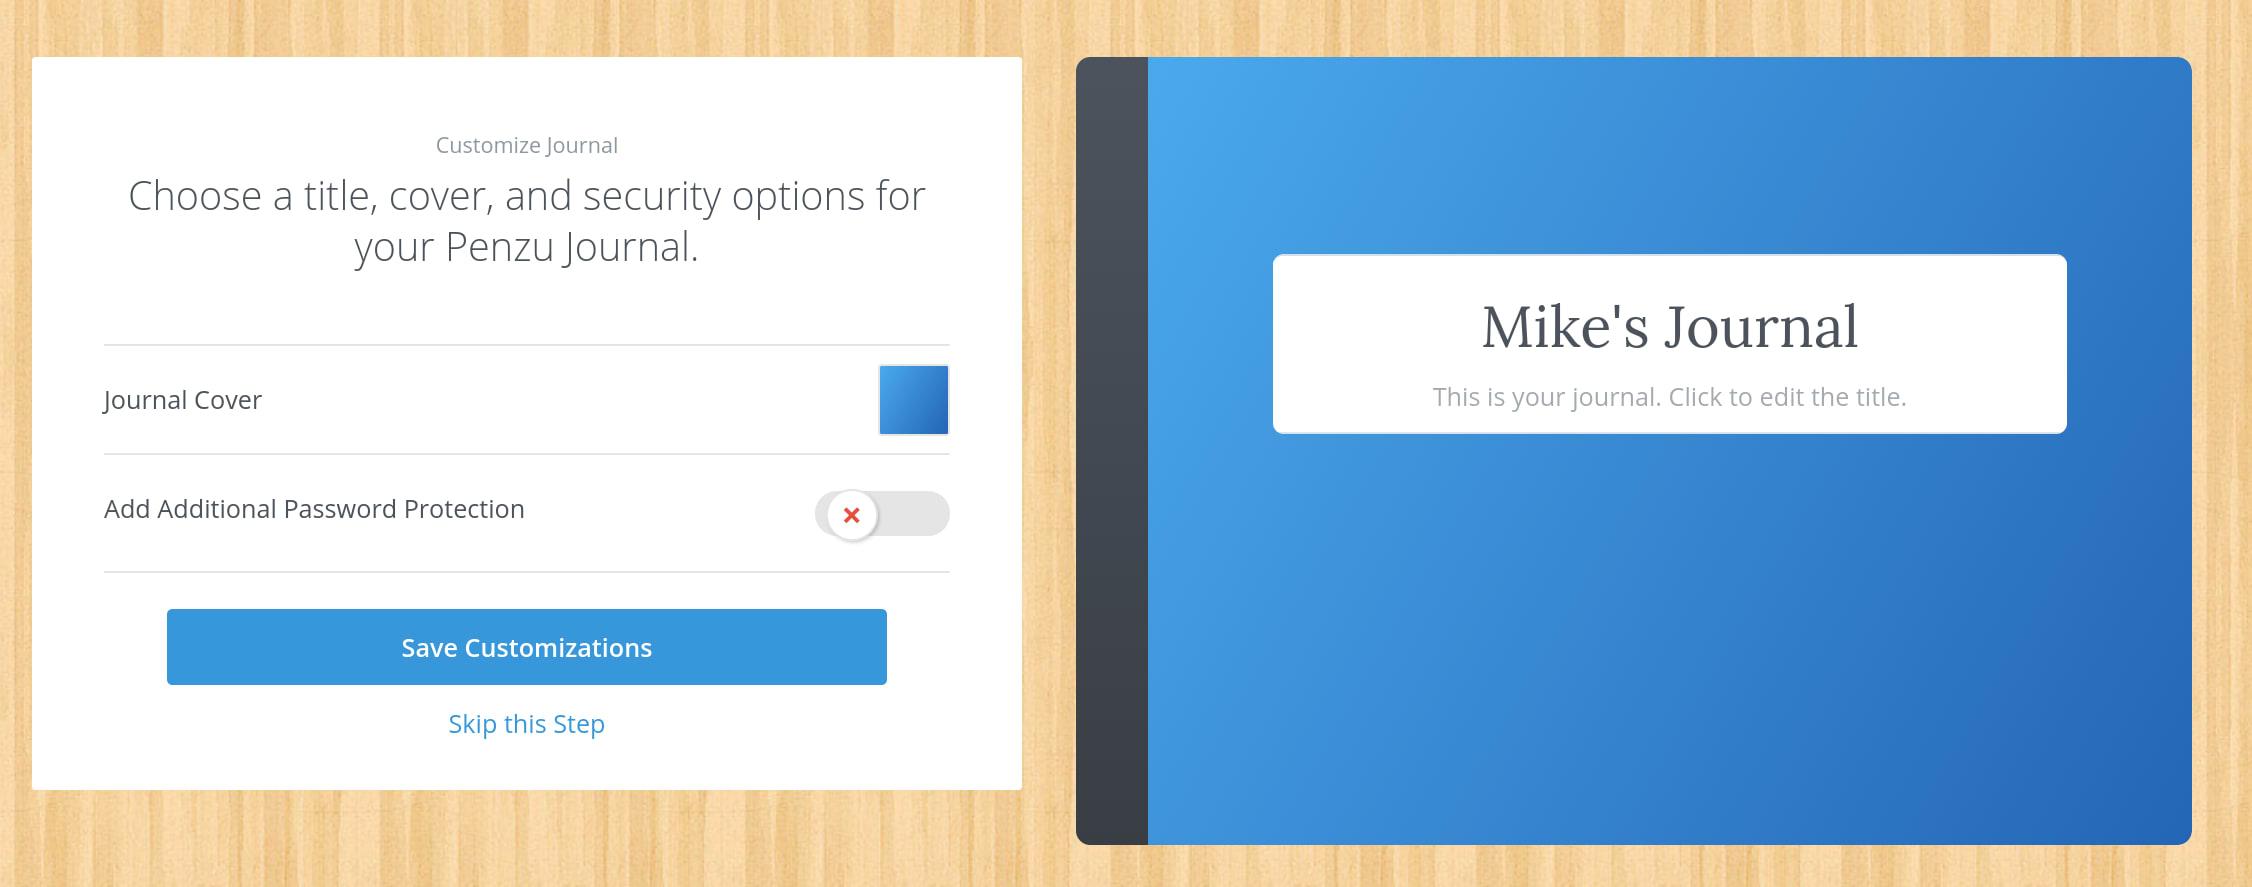 Customizing your Journal